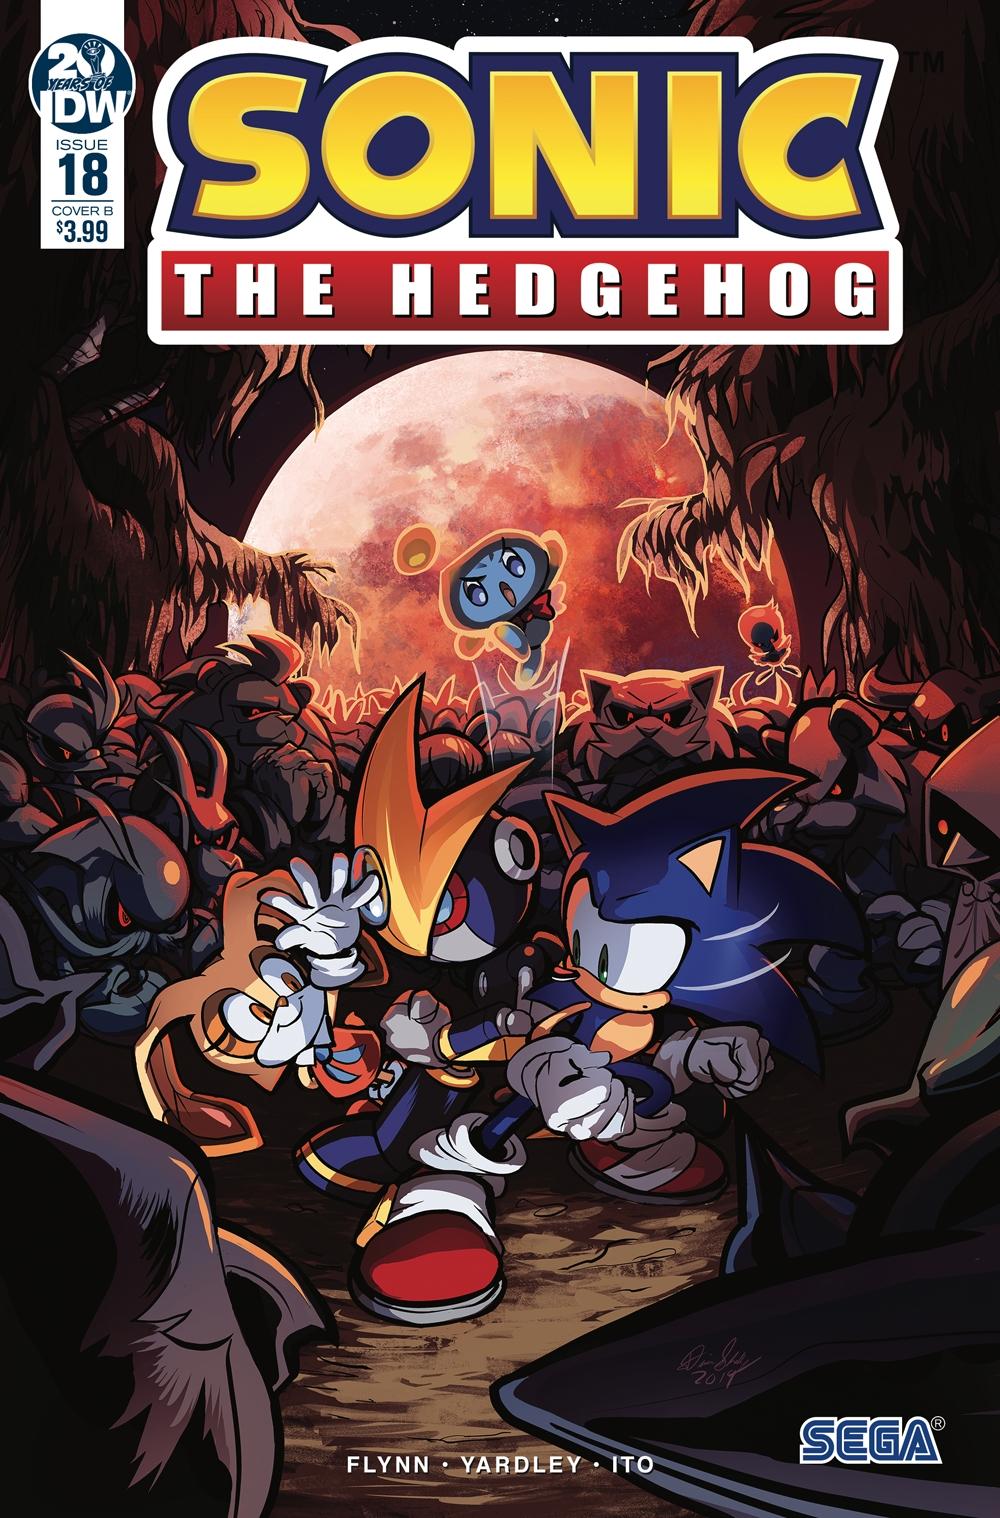 Sonic The Hedgehog #18 Cover B